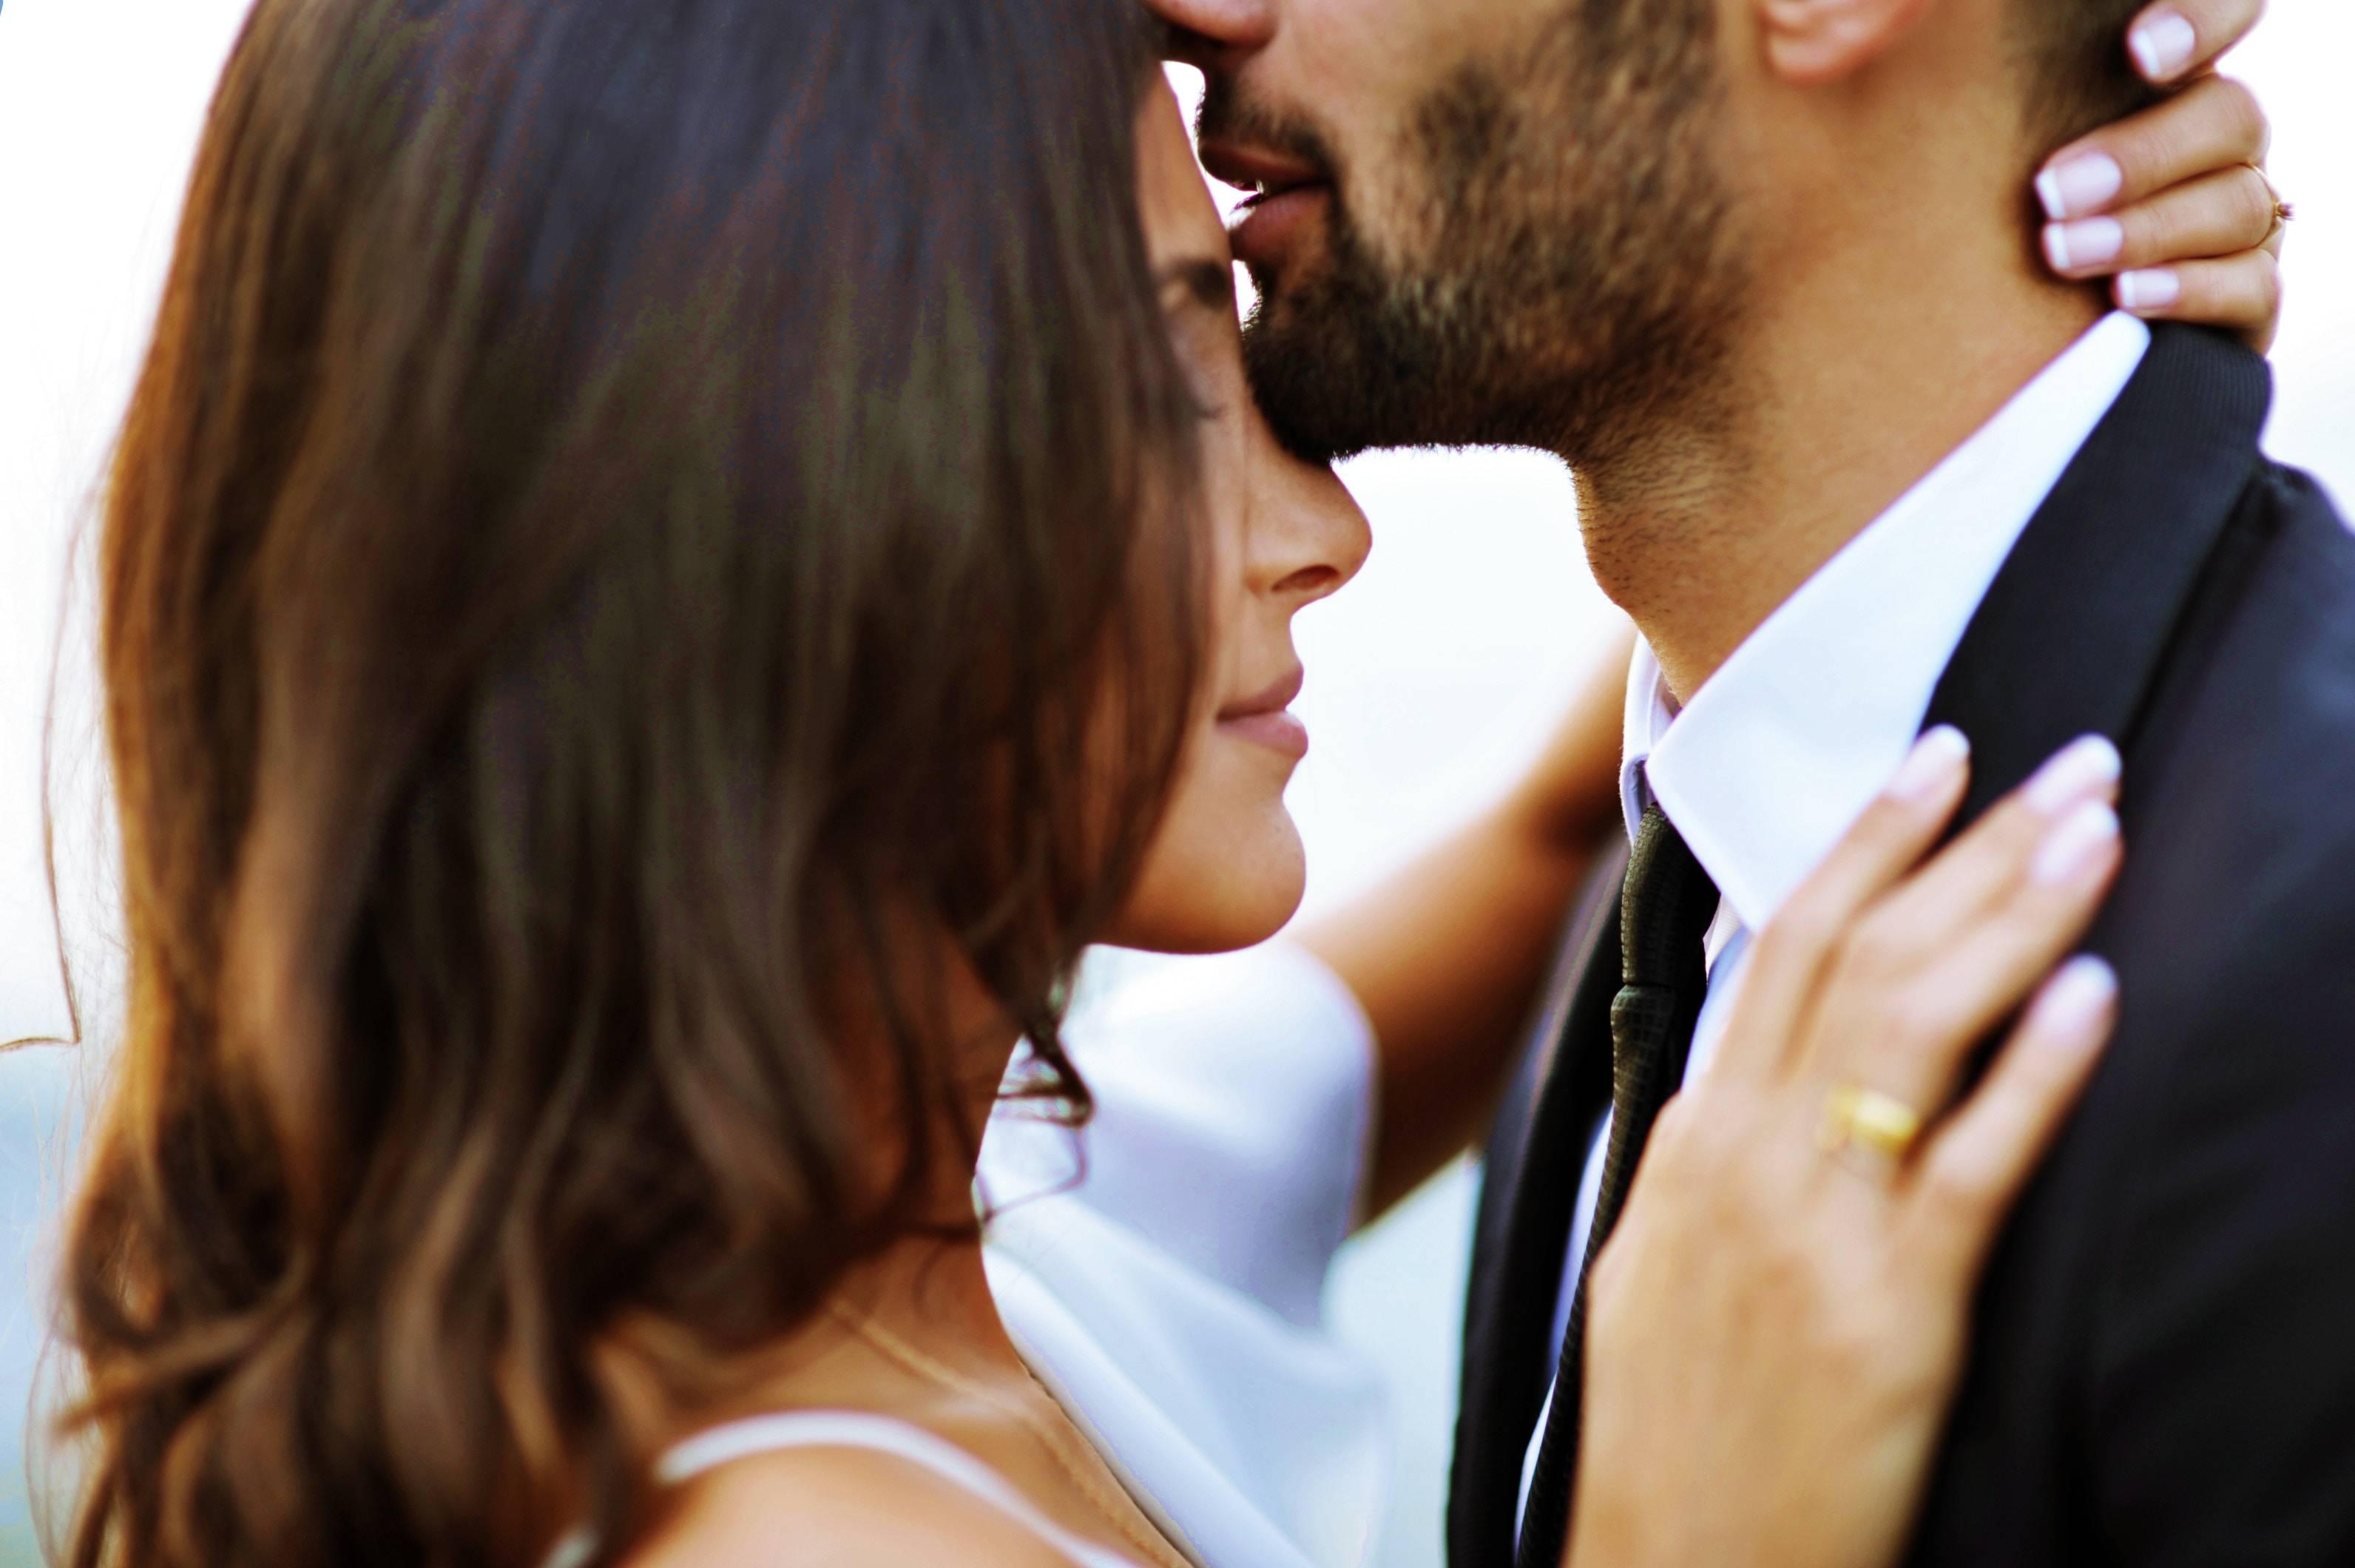 Love, Lust & Infatuation